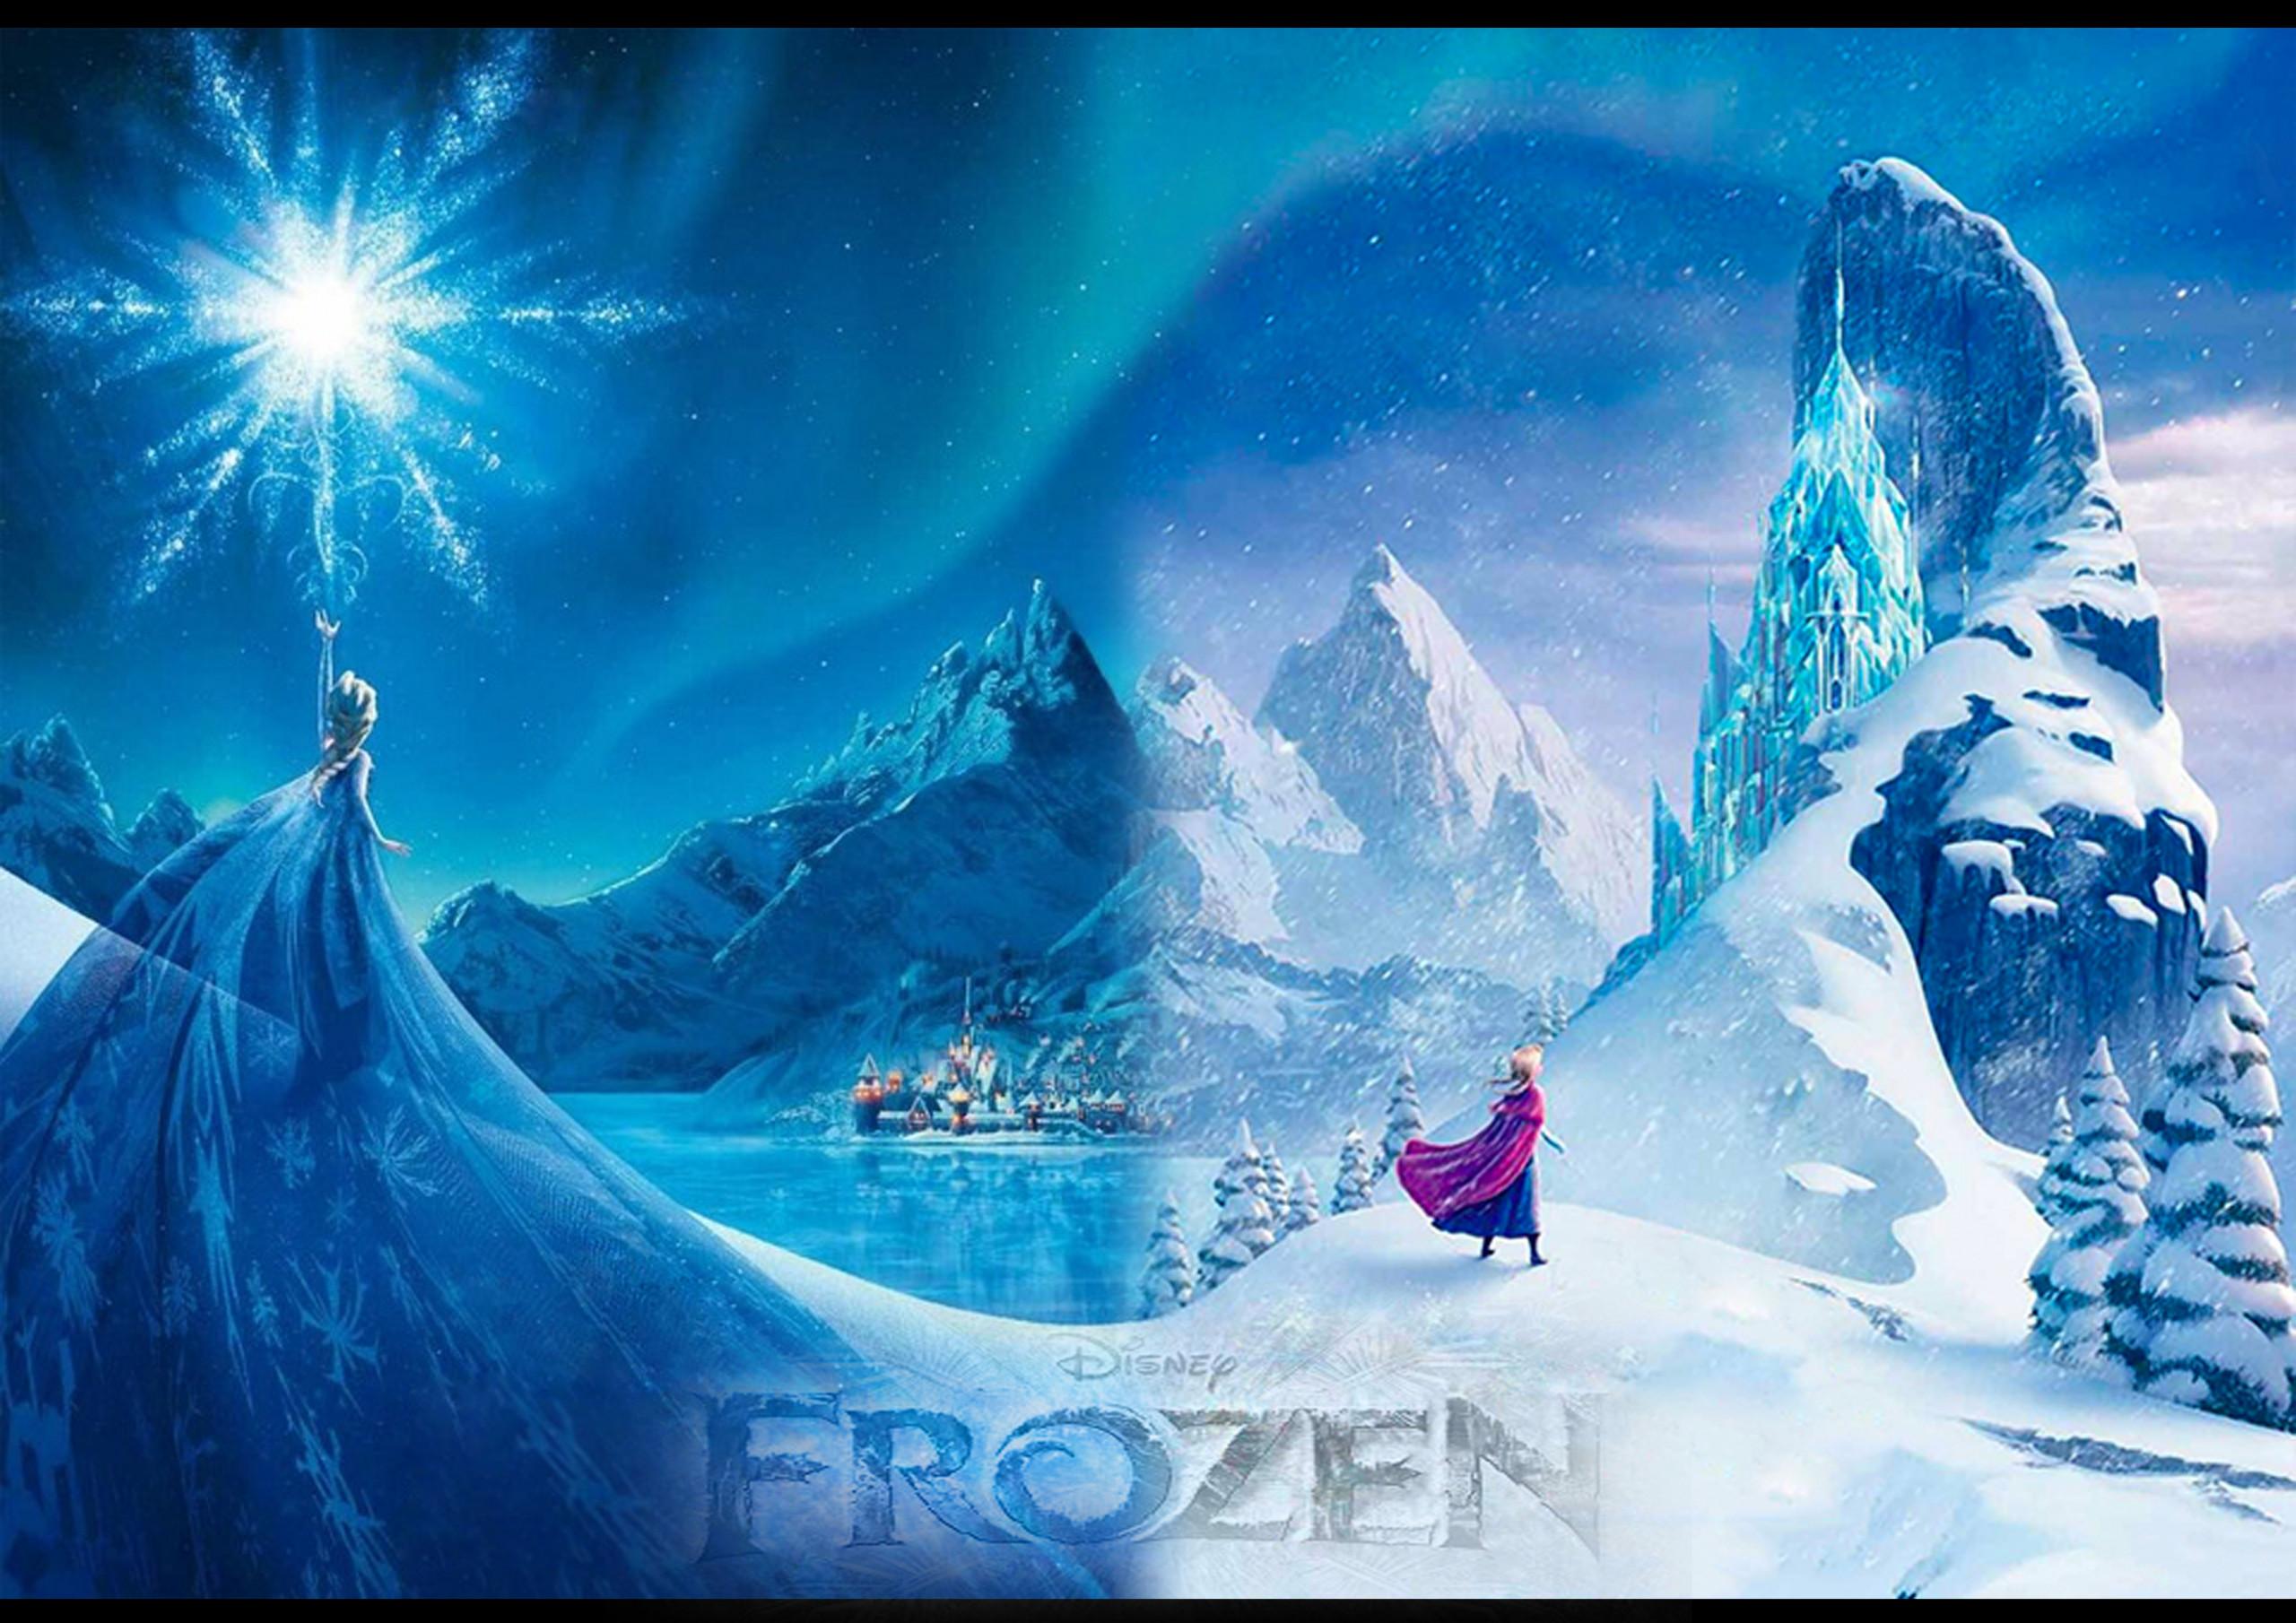 hinh nen frozen elsa 2 scaled